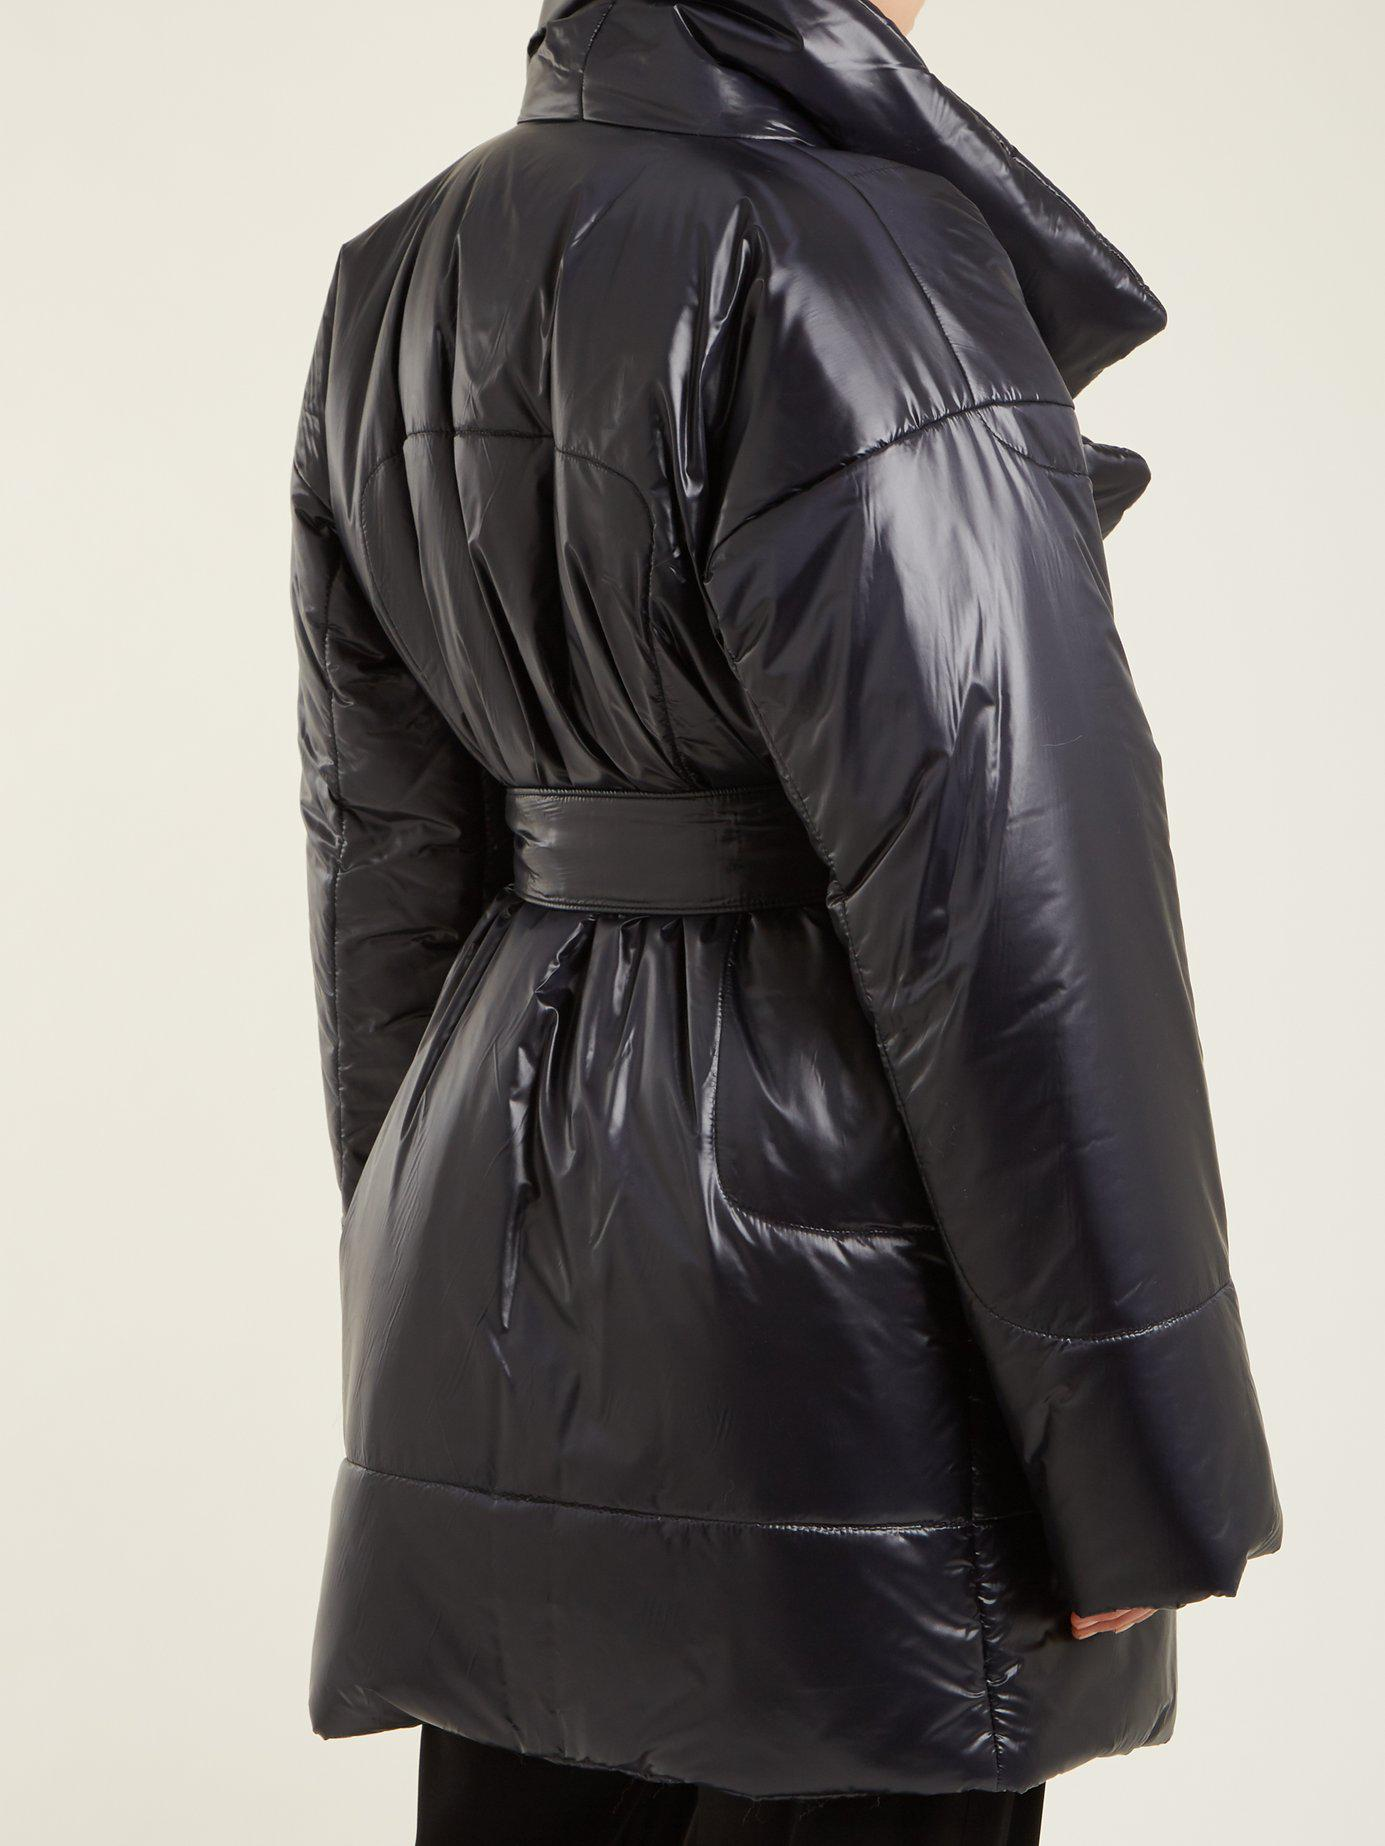 Manteau mi-long à imprimé camouflage Sleeping BagNorma Kamali Gros Rabais Bhm4ABWG2W